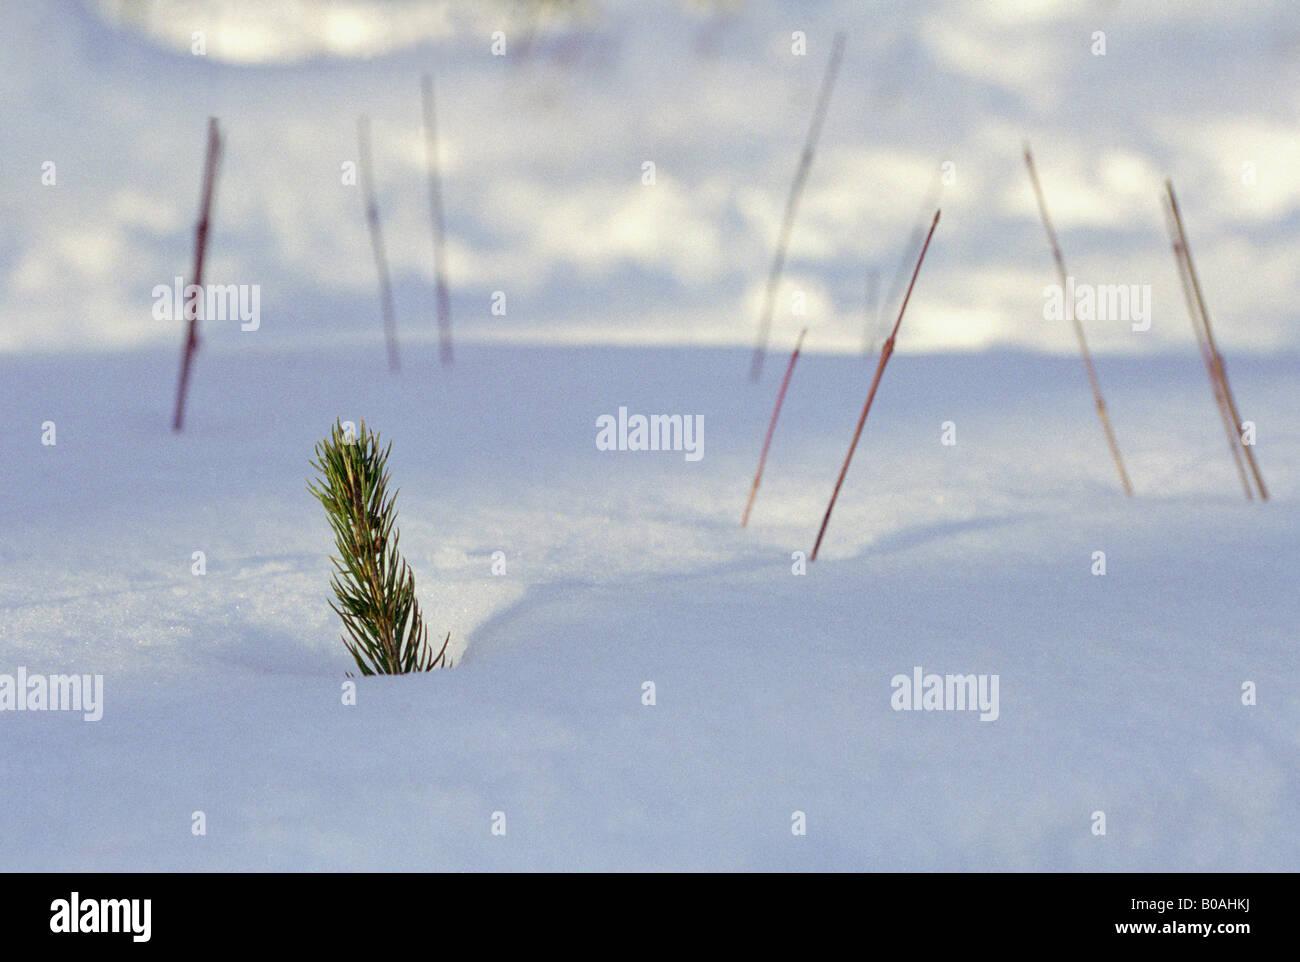 sapling emerging through snow - Stock Image